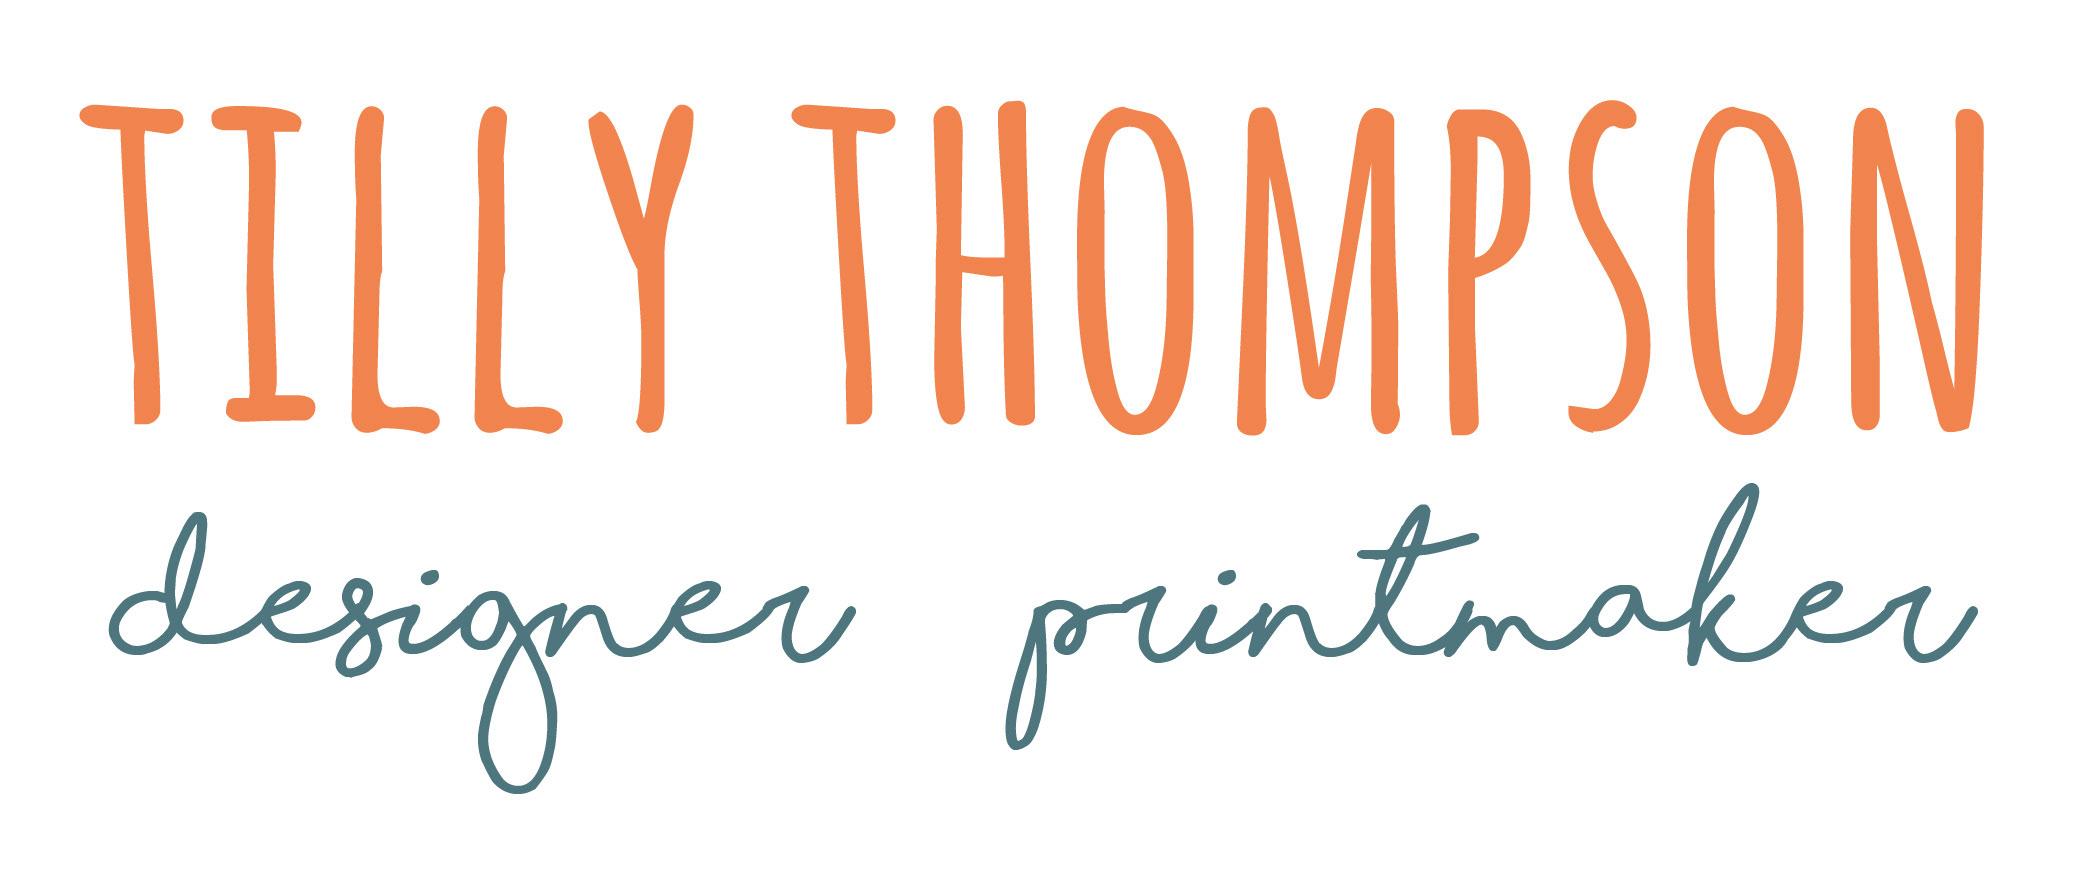 tilly thompson